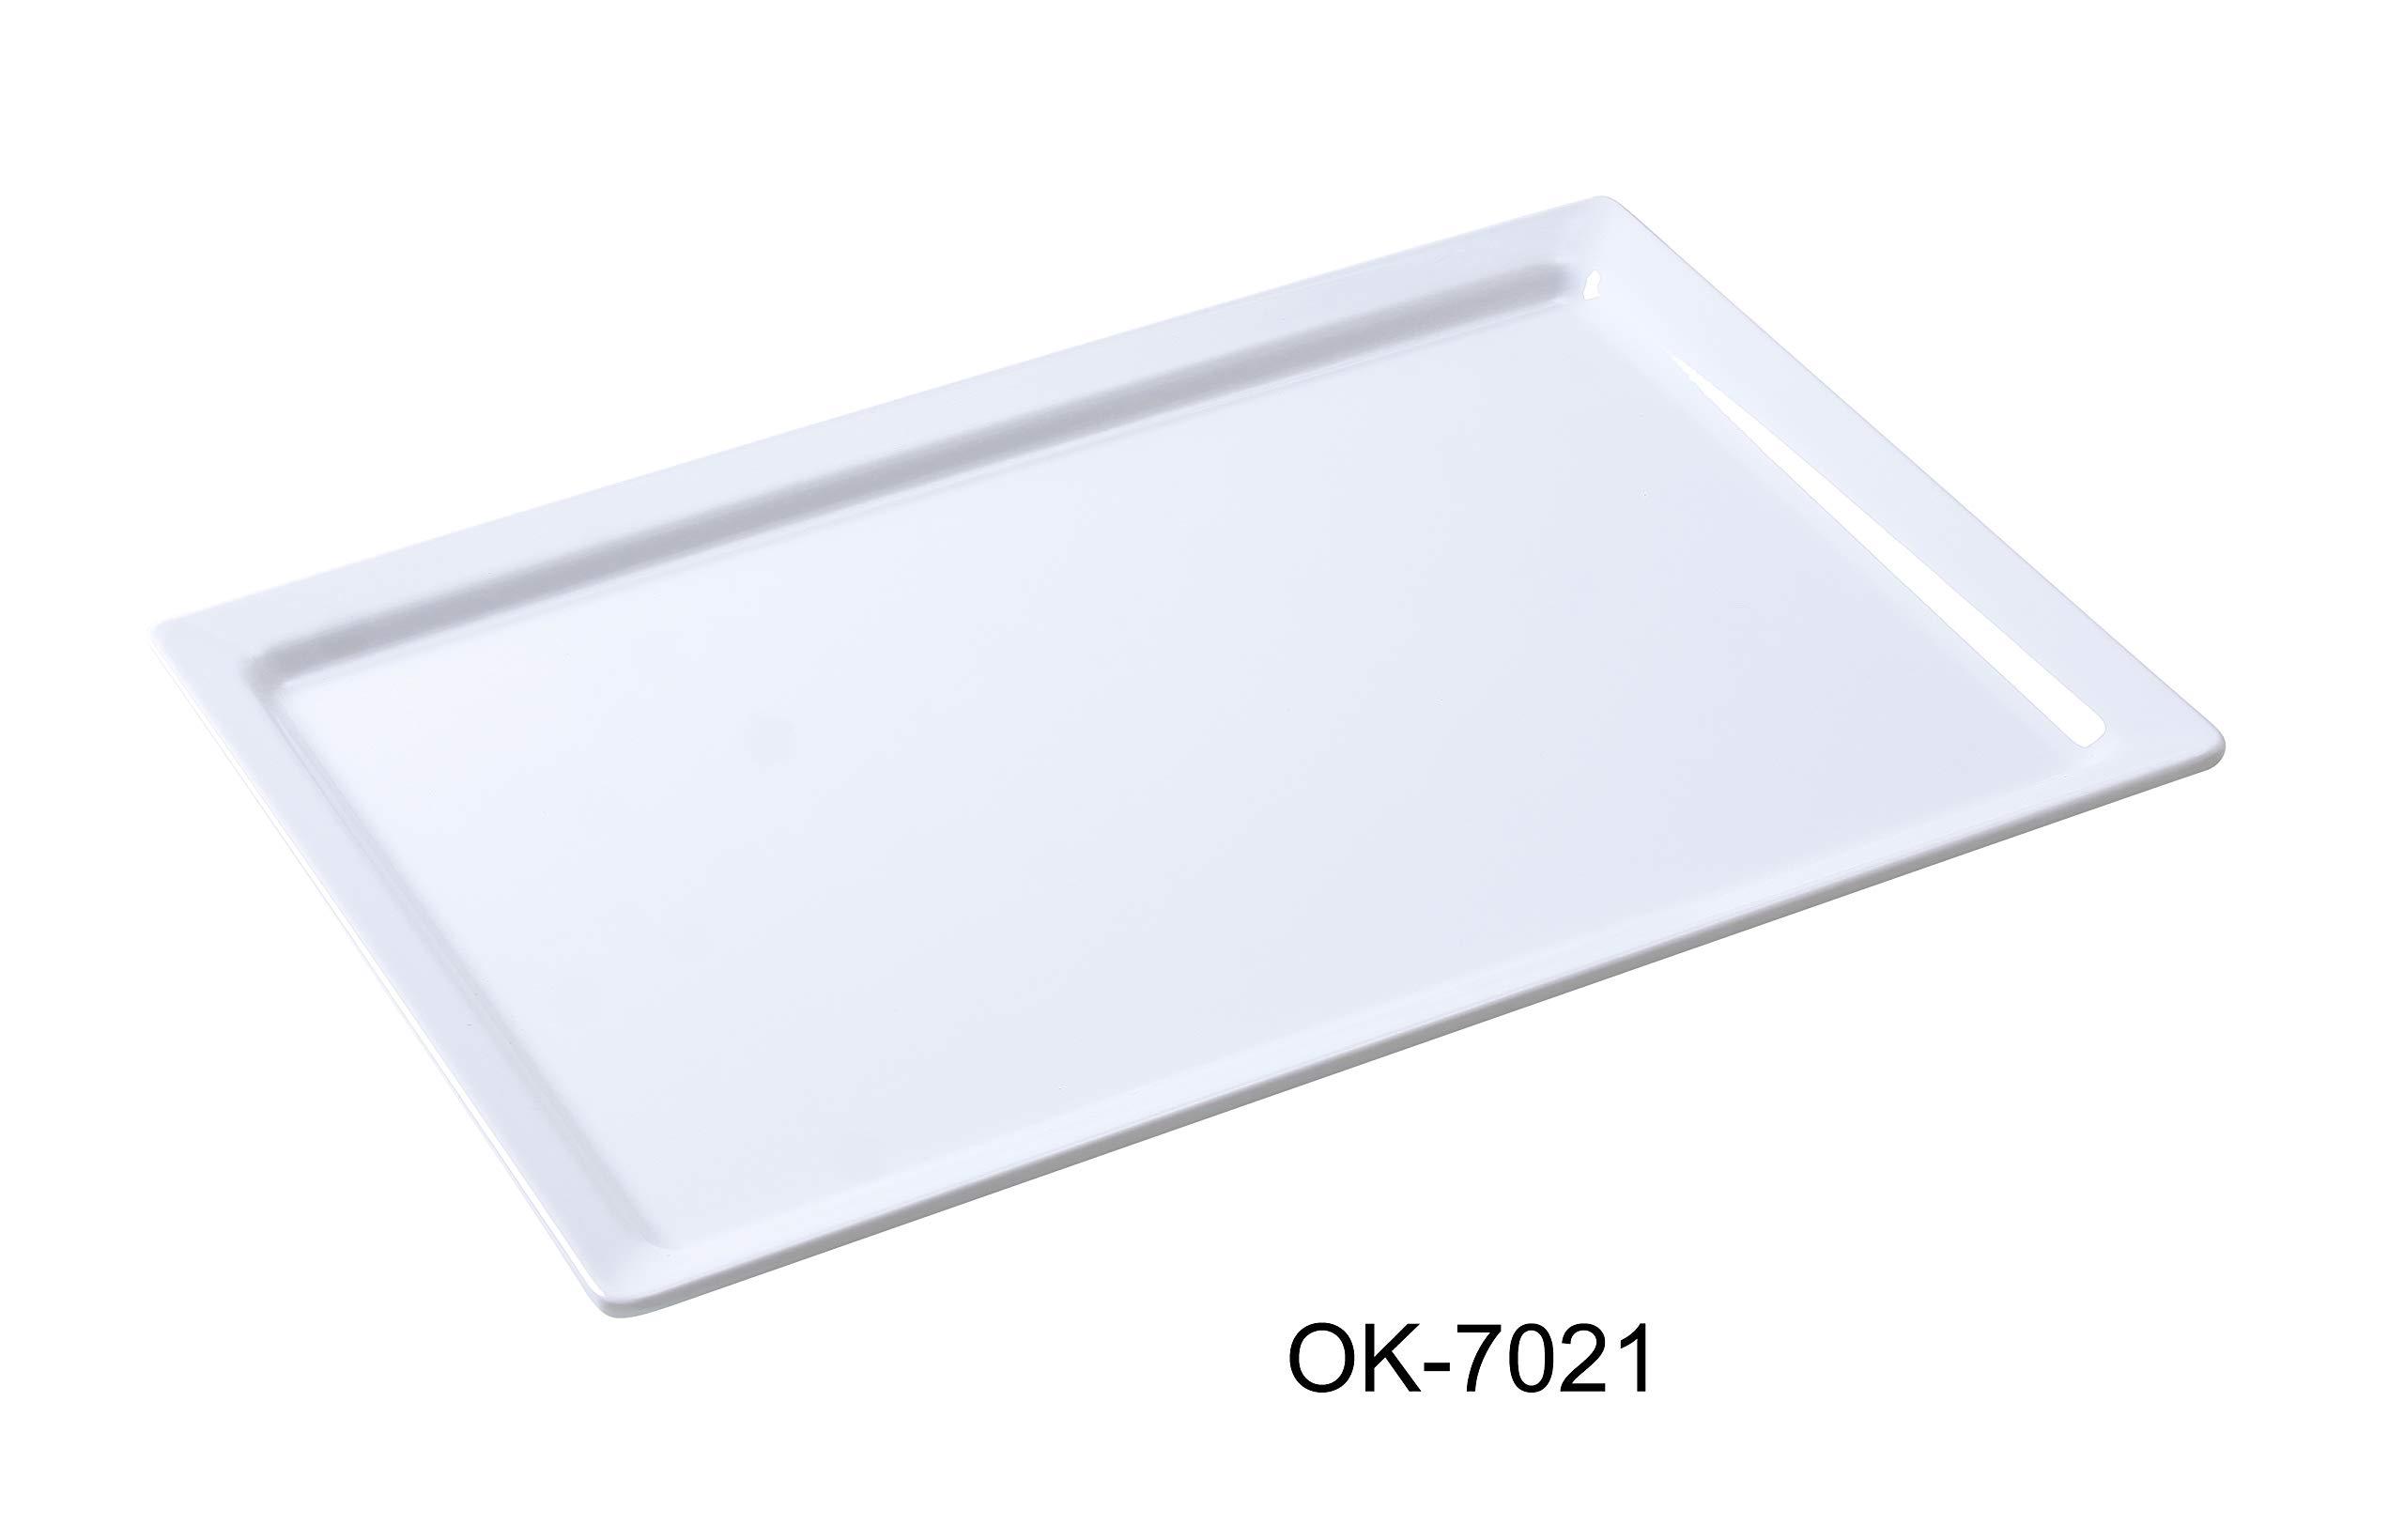 Yanco OK-7021 Osaka-2 Display Plate, Rectangular, 21'' Length, 13'' Width, Melamine, White Color, Pack of 6 by Yanco (Image #2)